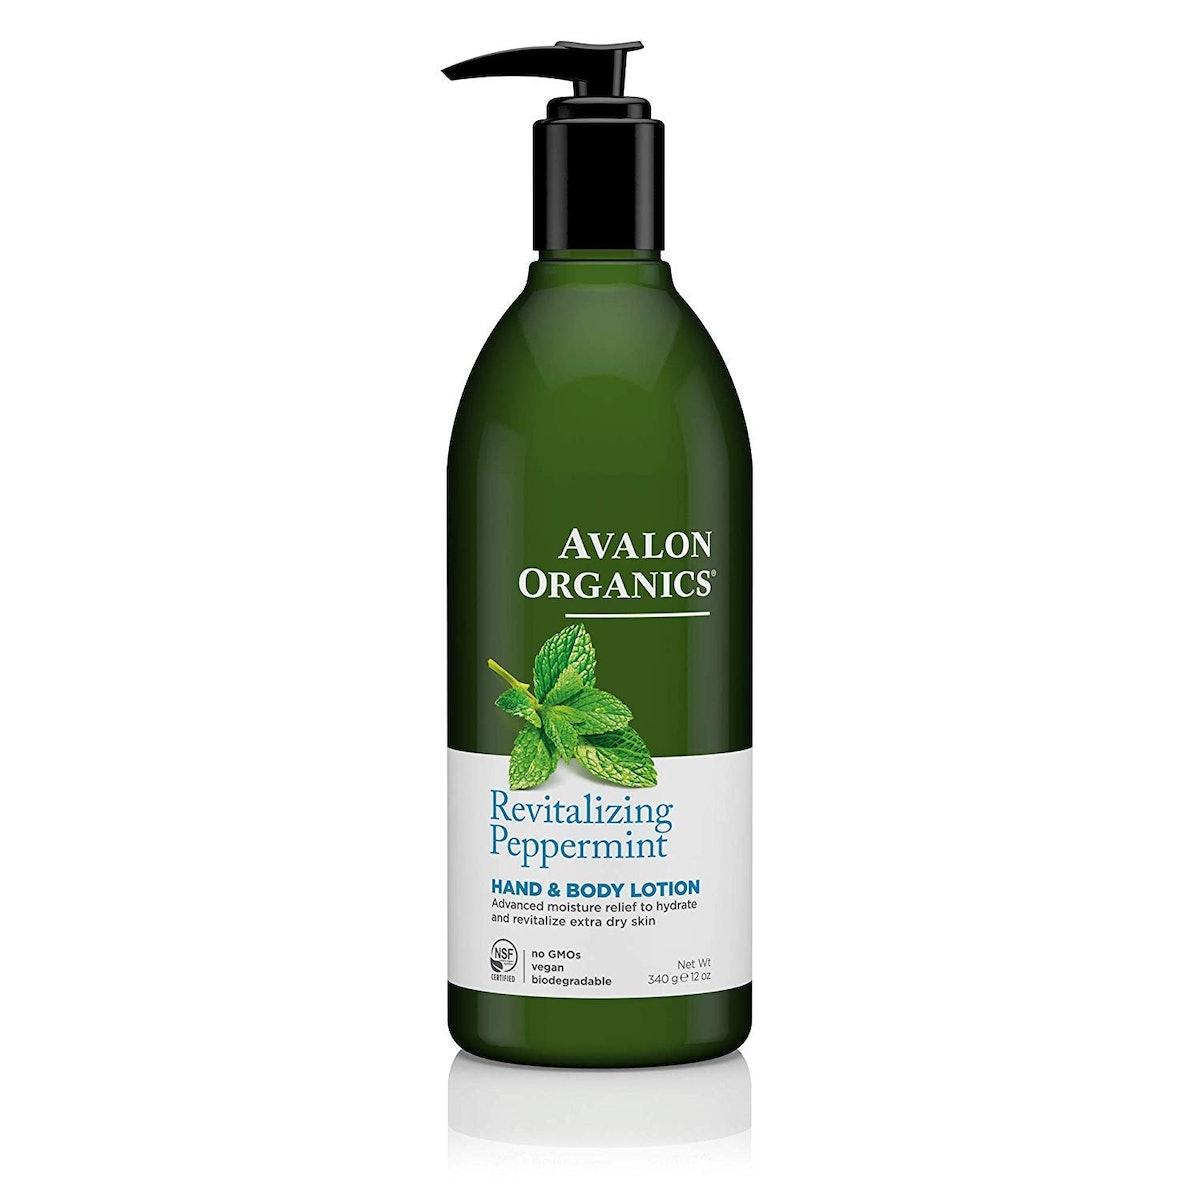 Avalon Organics Hand & Body Lotion